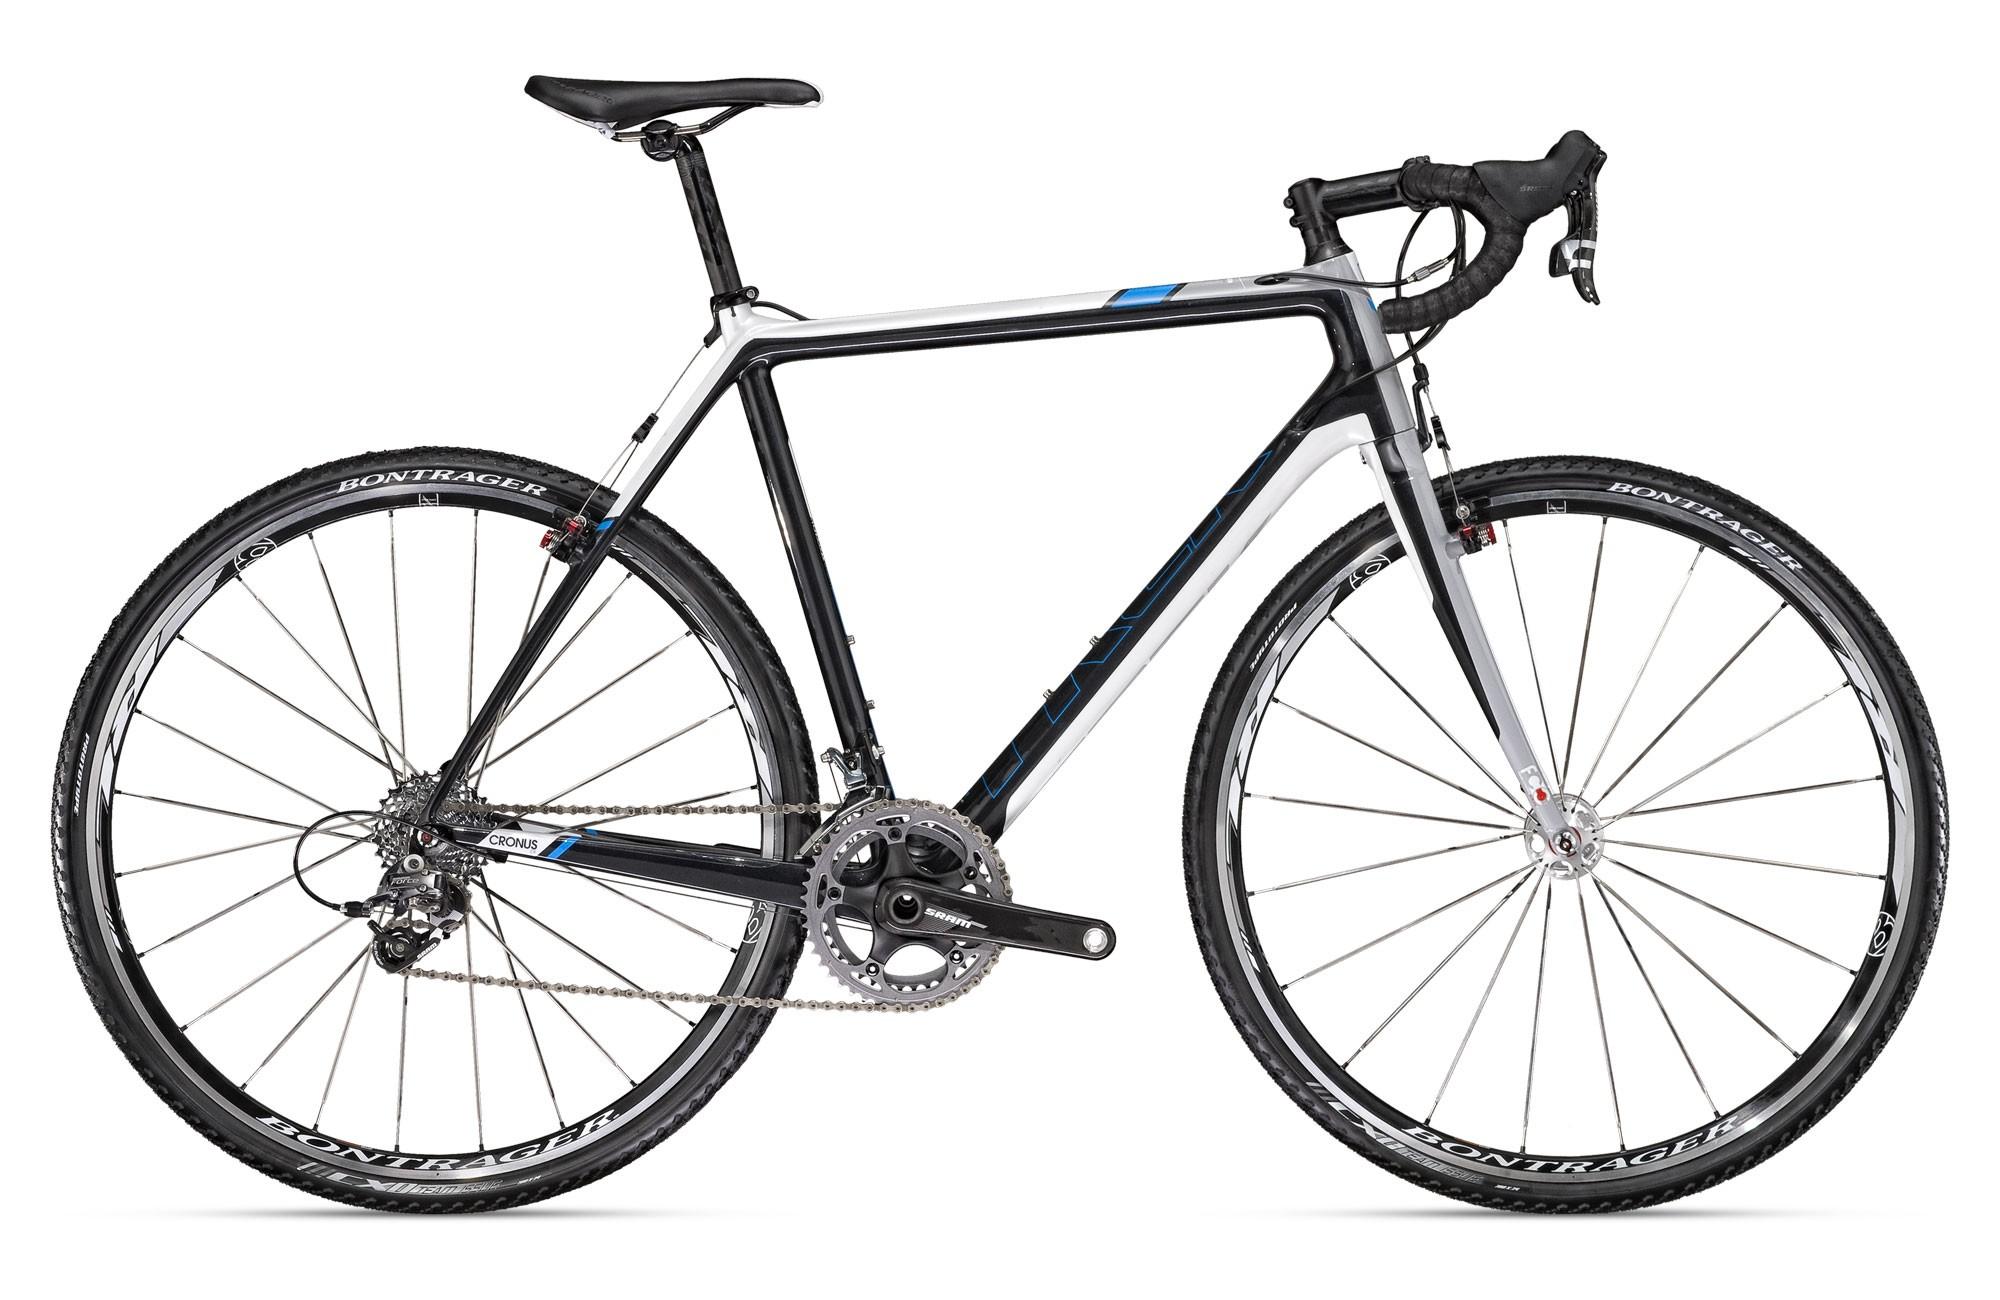 The new Trek Gary Fisher Cronus CX carbon fibre cyclocross bike